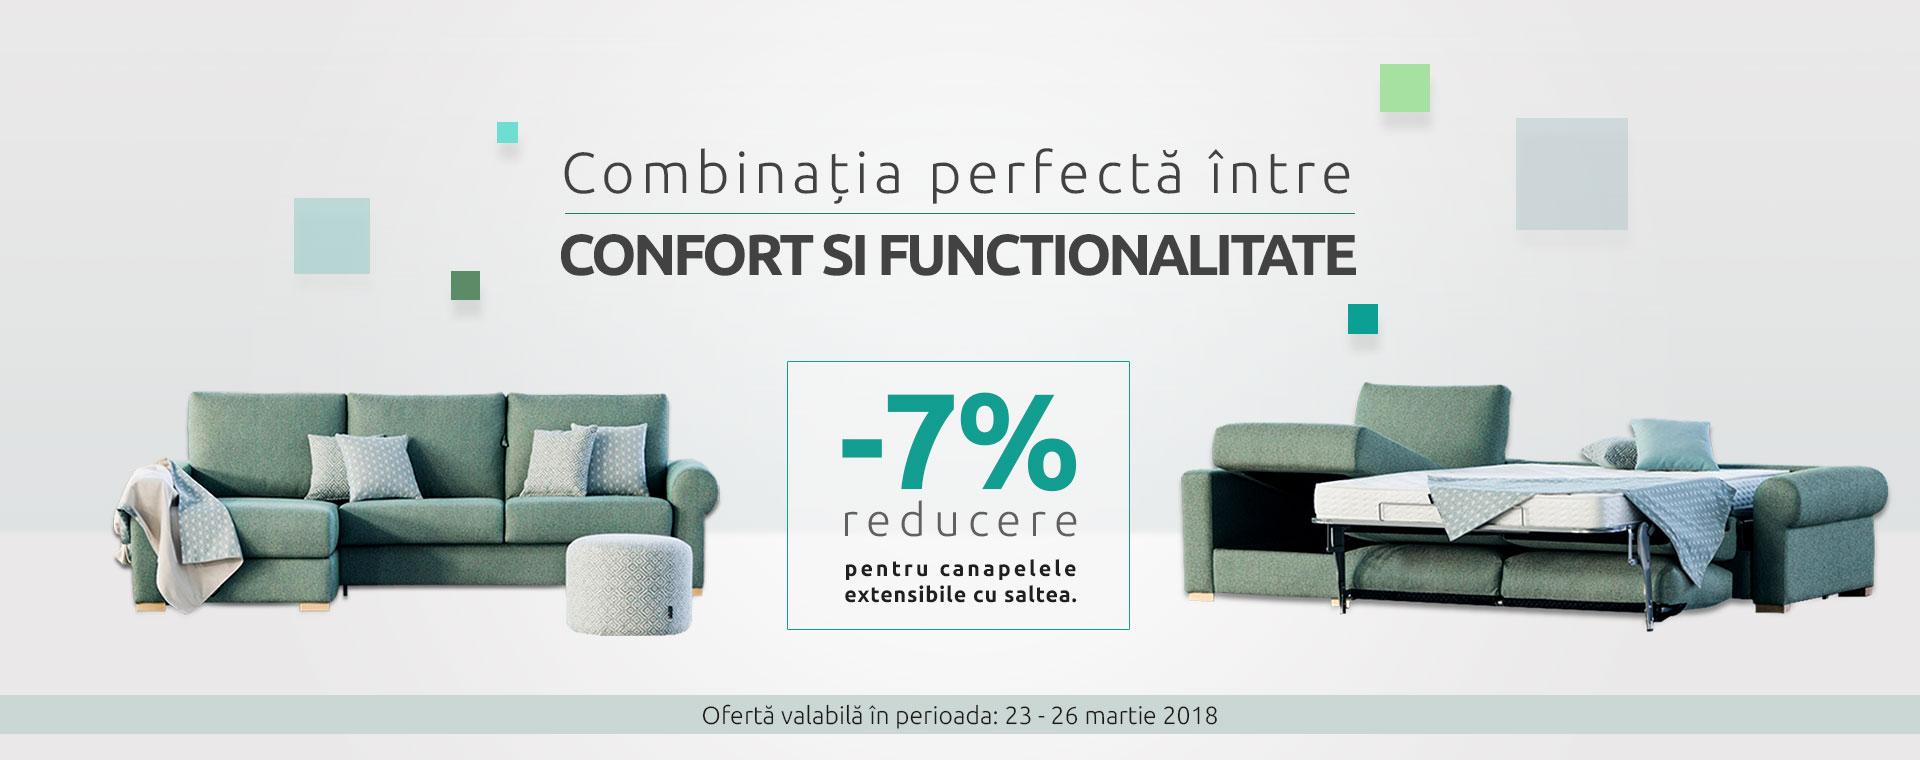 confort-functionalitate